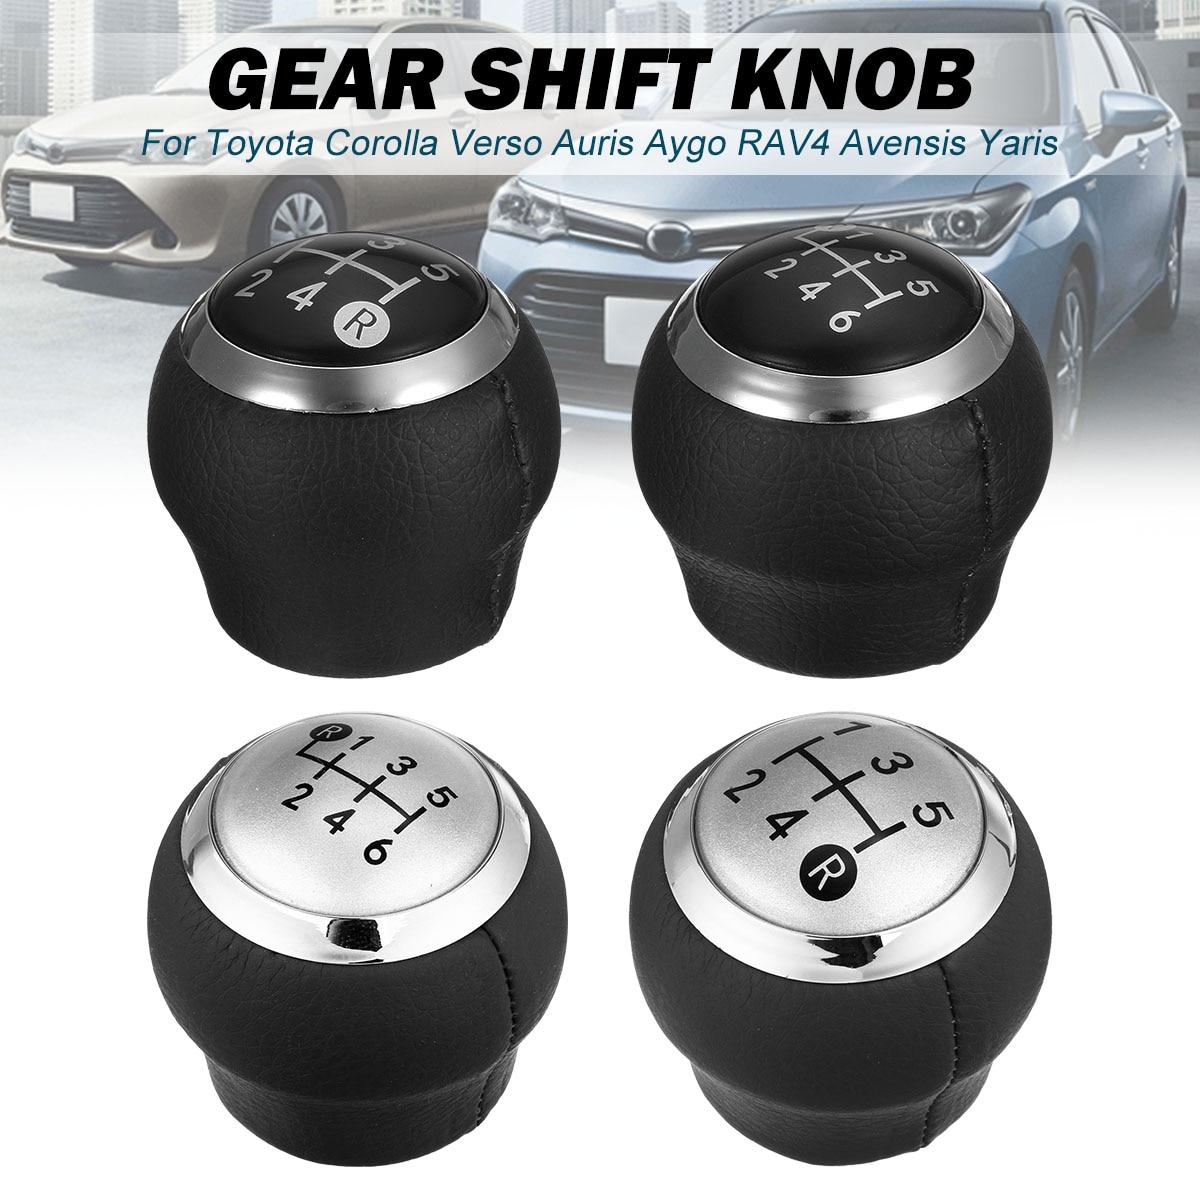 6Speed Gear Stick Shift Lever Knob Part For Toyota Corolla Verso Rav4 Yaris Aygo